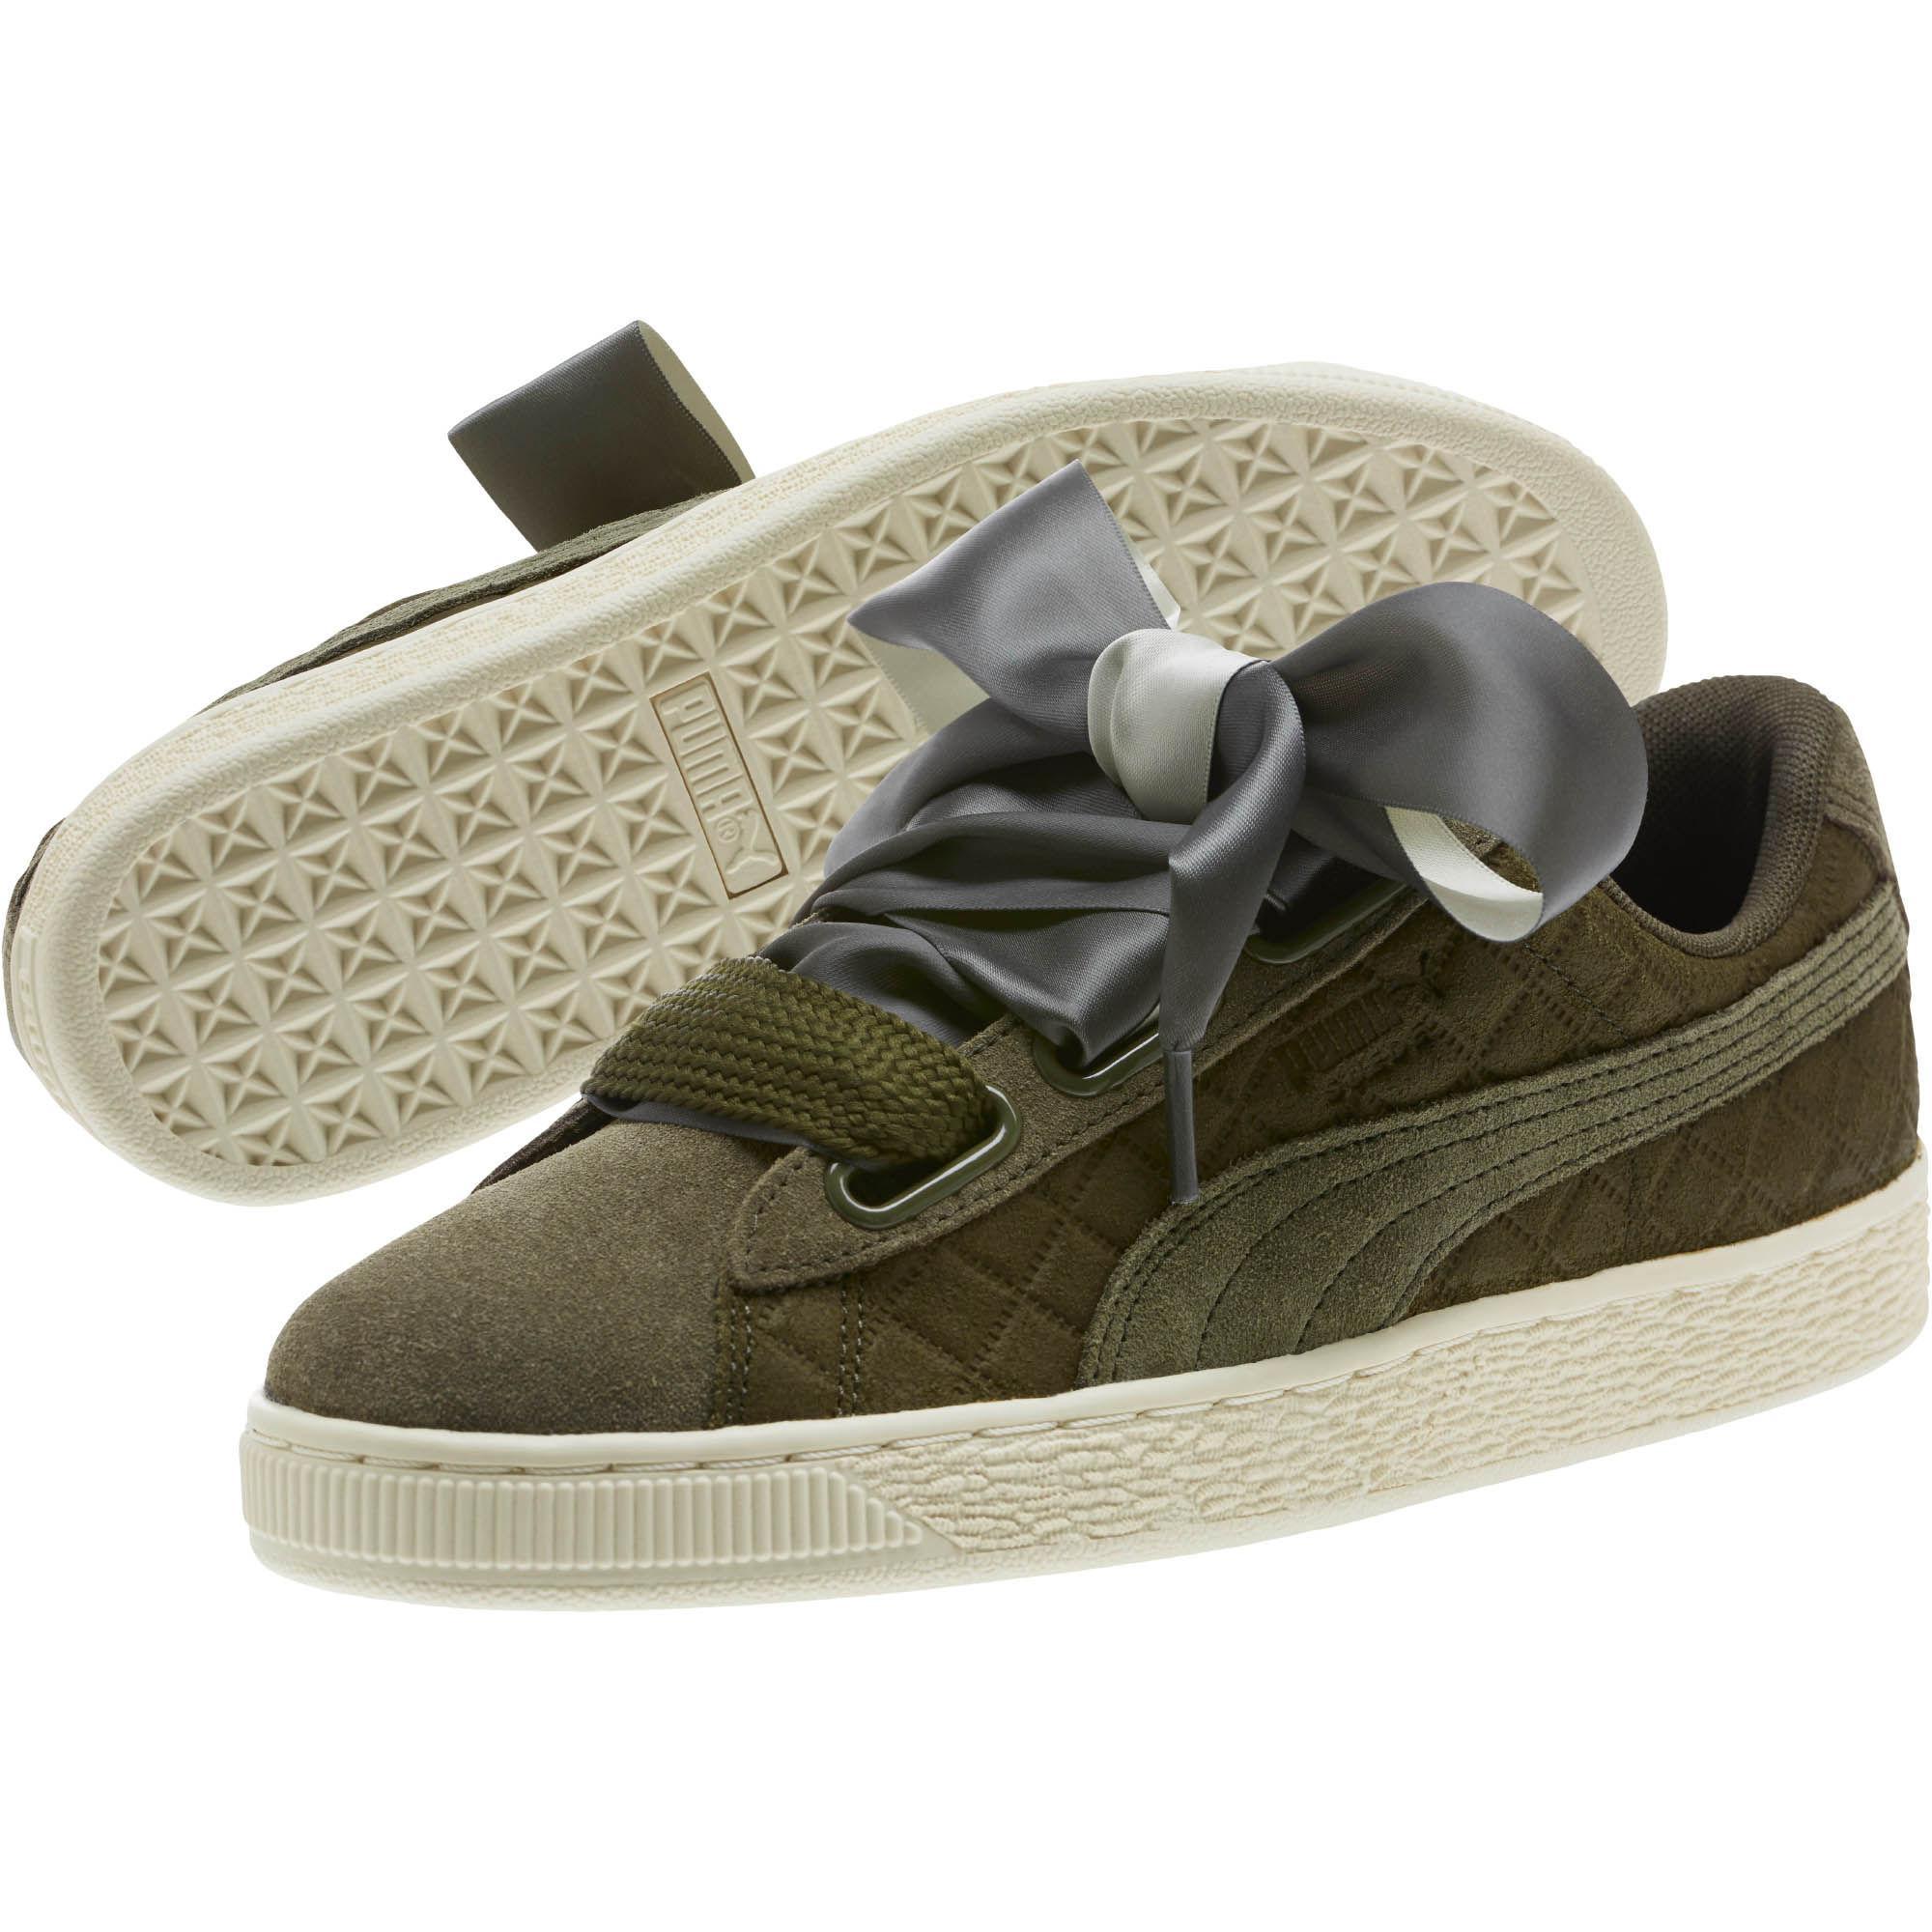 375380c698 PUMA Green Suede Heart Quilt Women's Sneakers